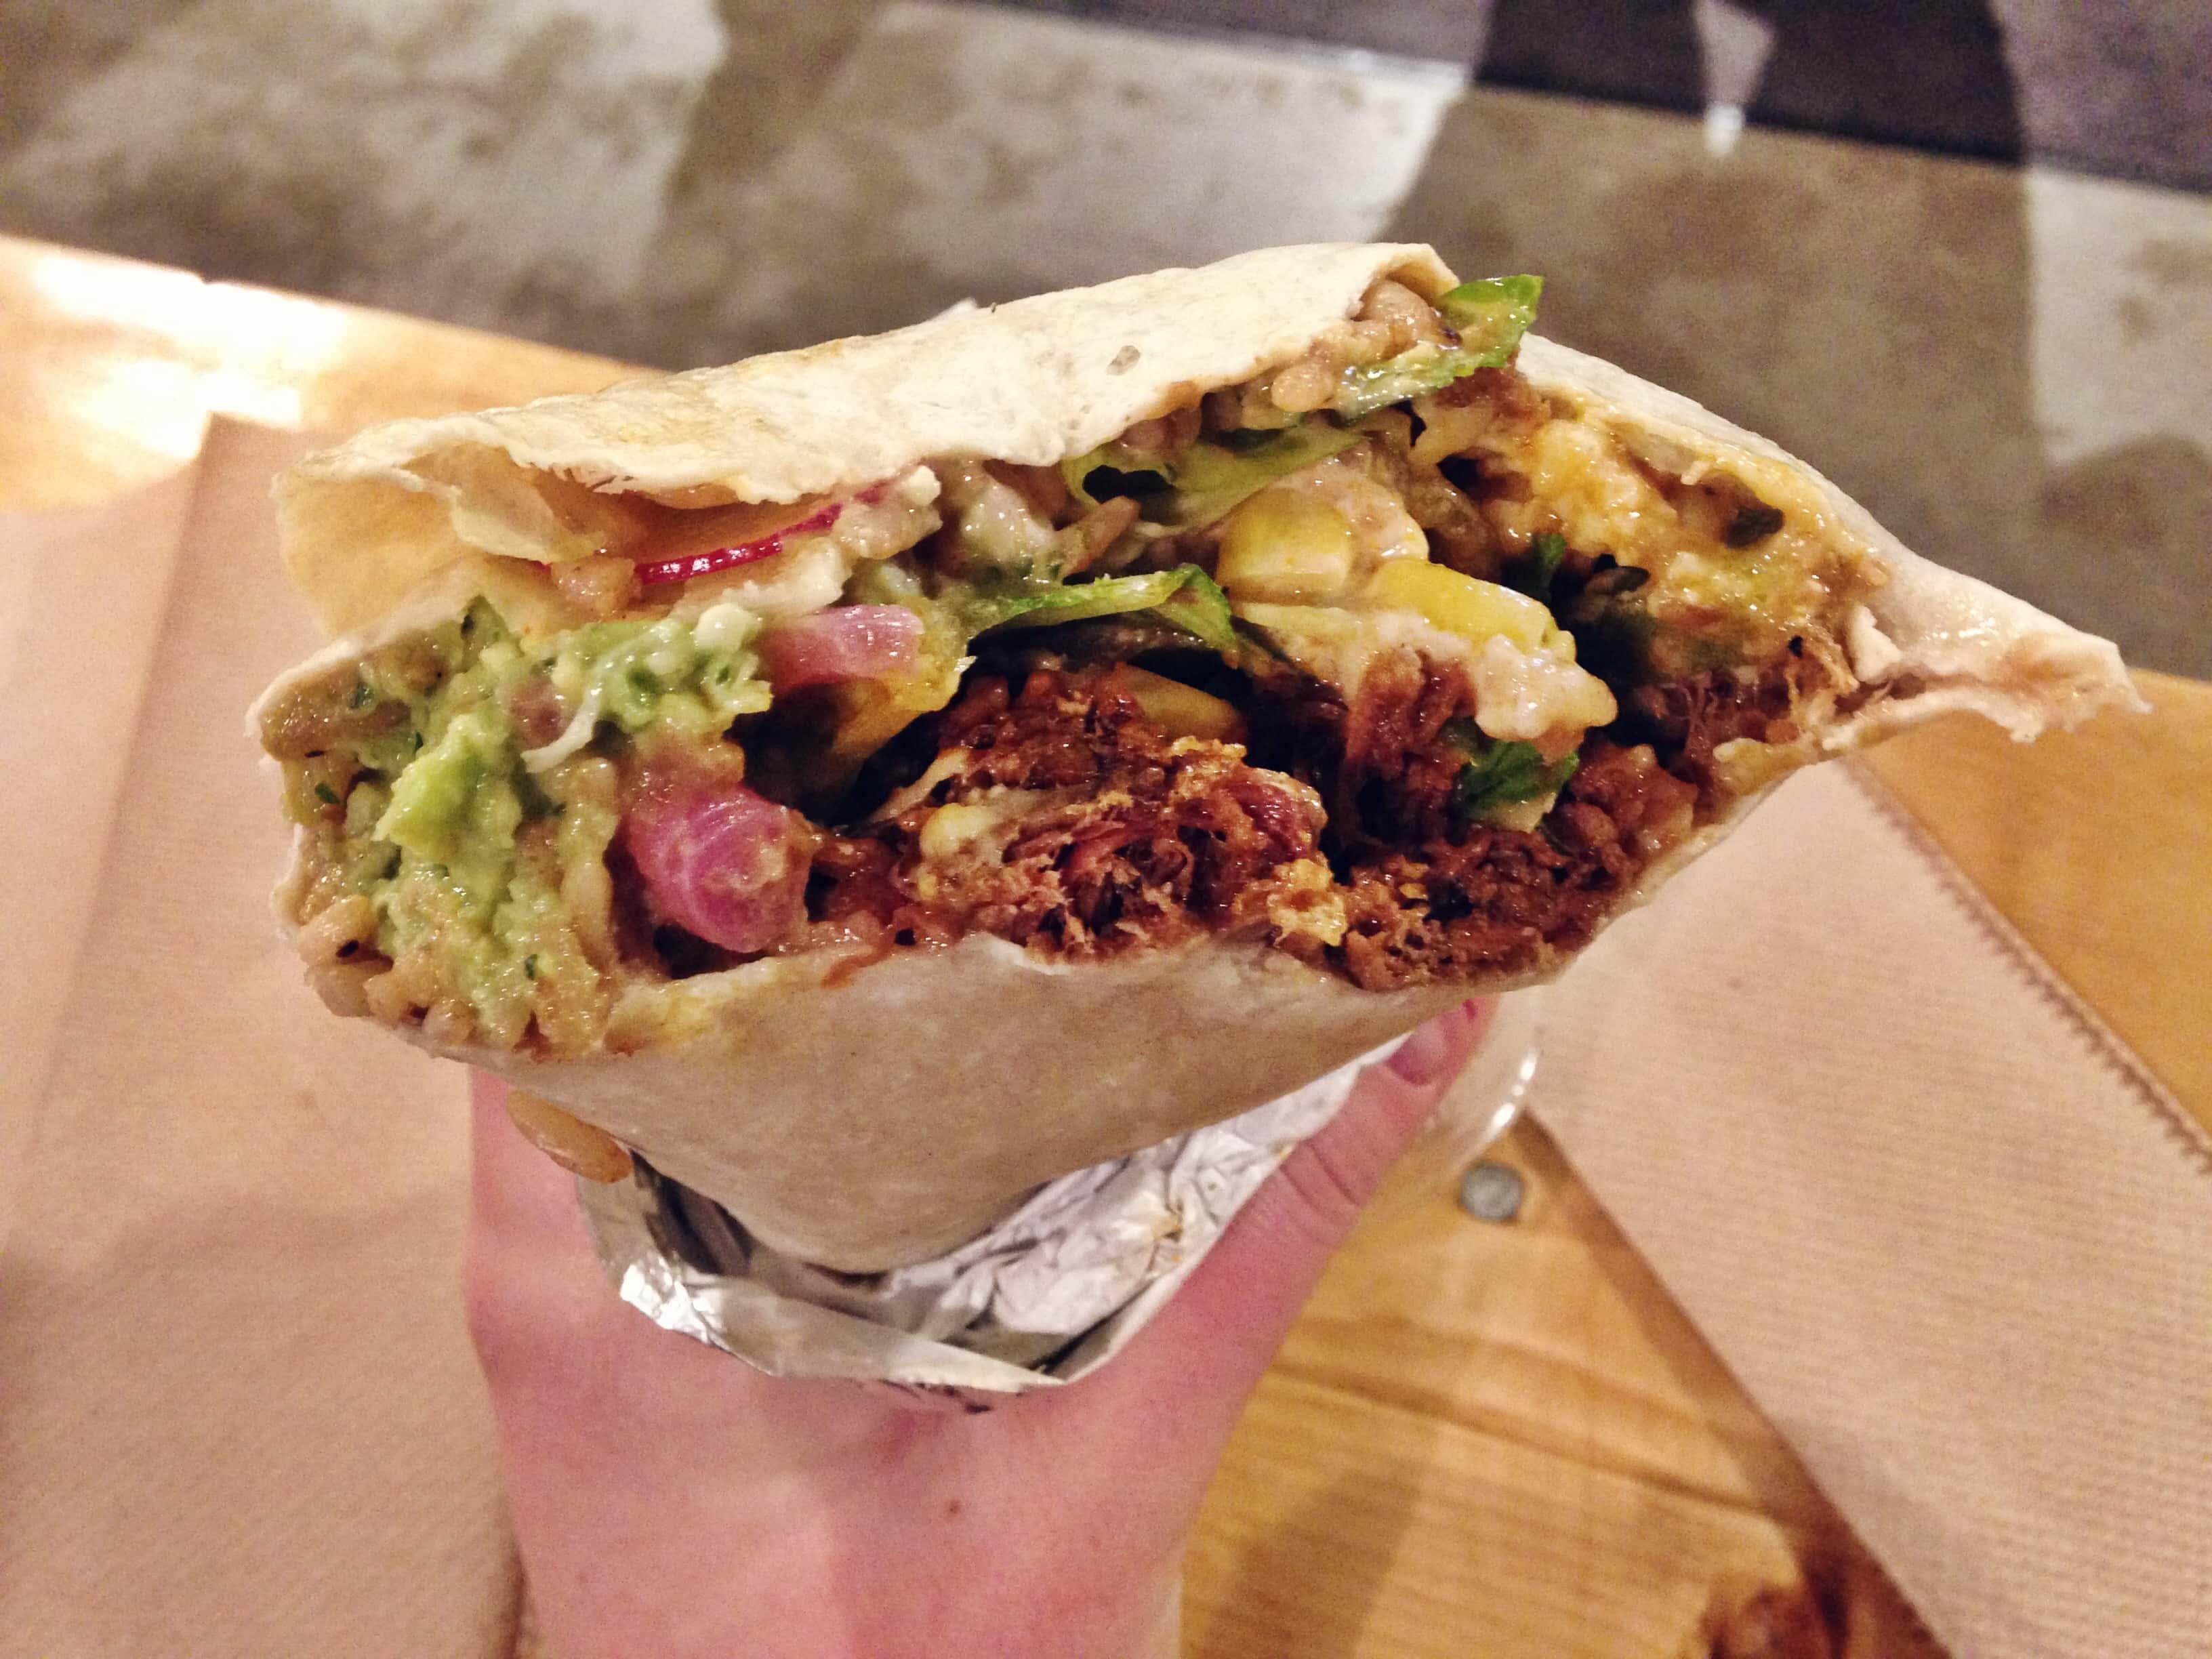 Tejano BBQ Burrito Vieux Montréal restaurant